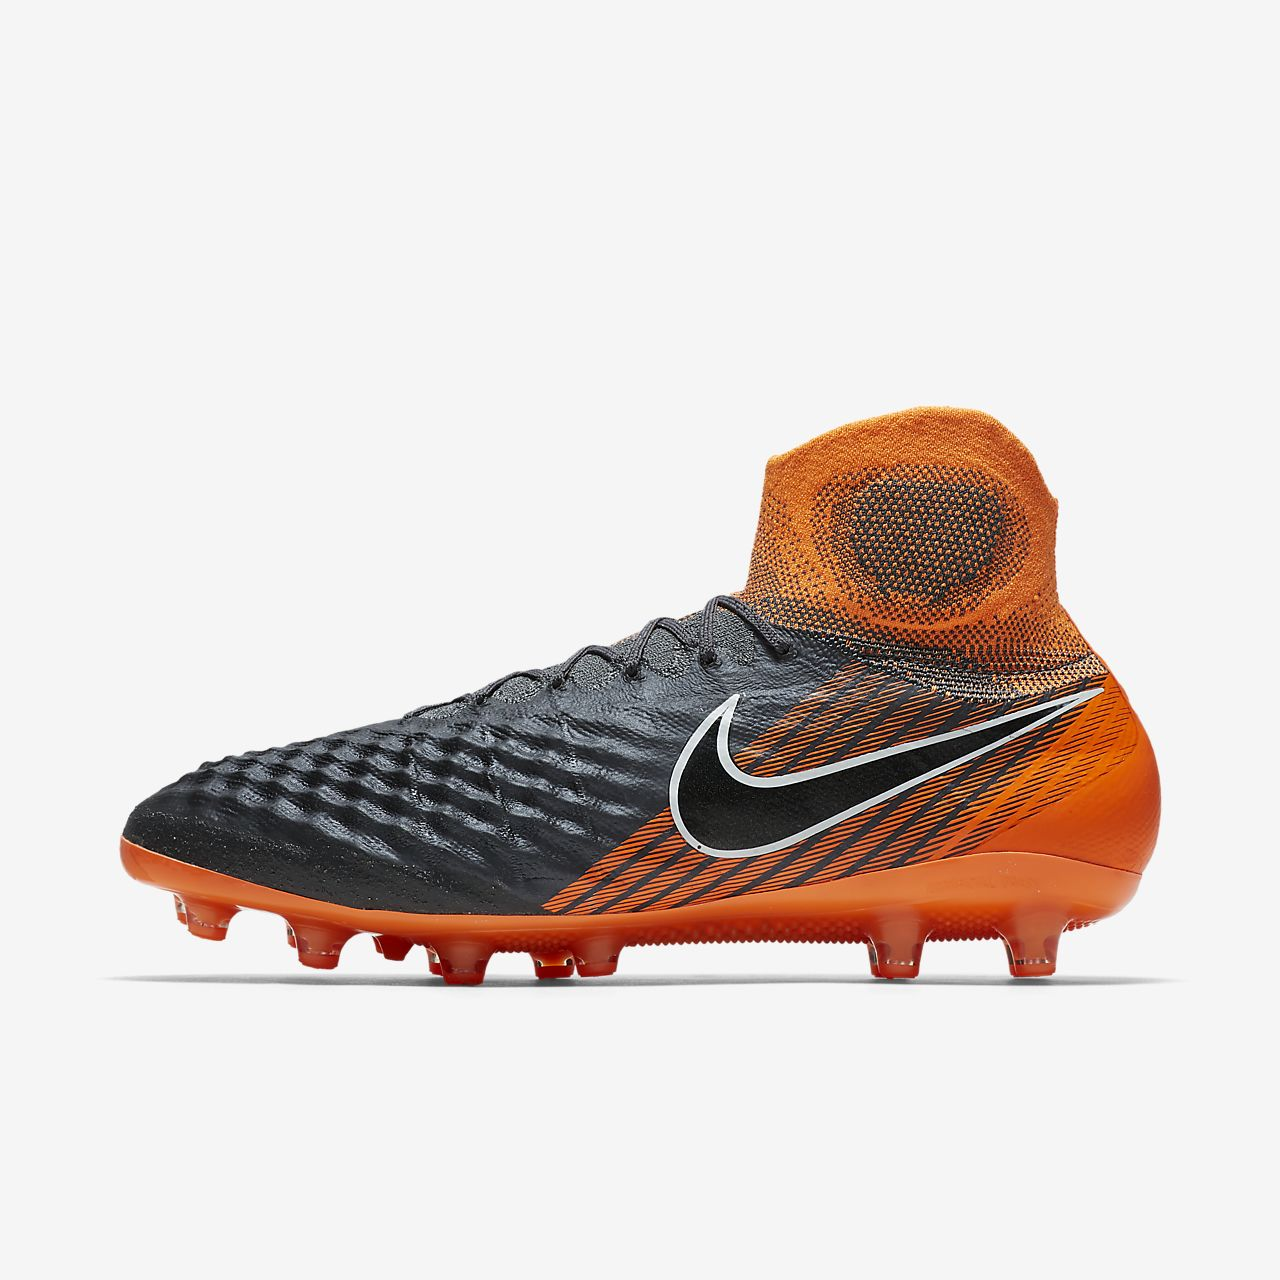 1803 Nike Magista Obra II Elite Dynamic Fit AG-PRO Men Soccer Cleats AH7401-080